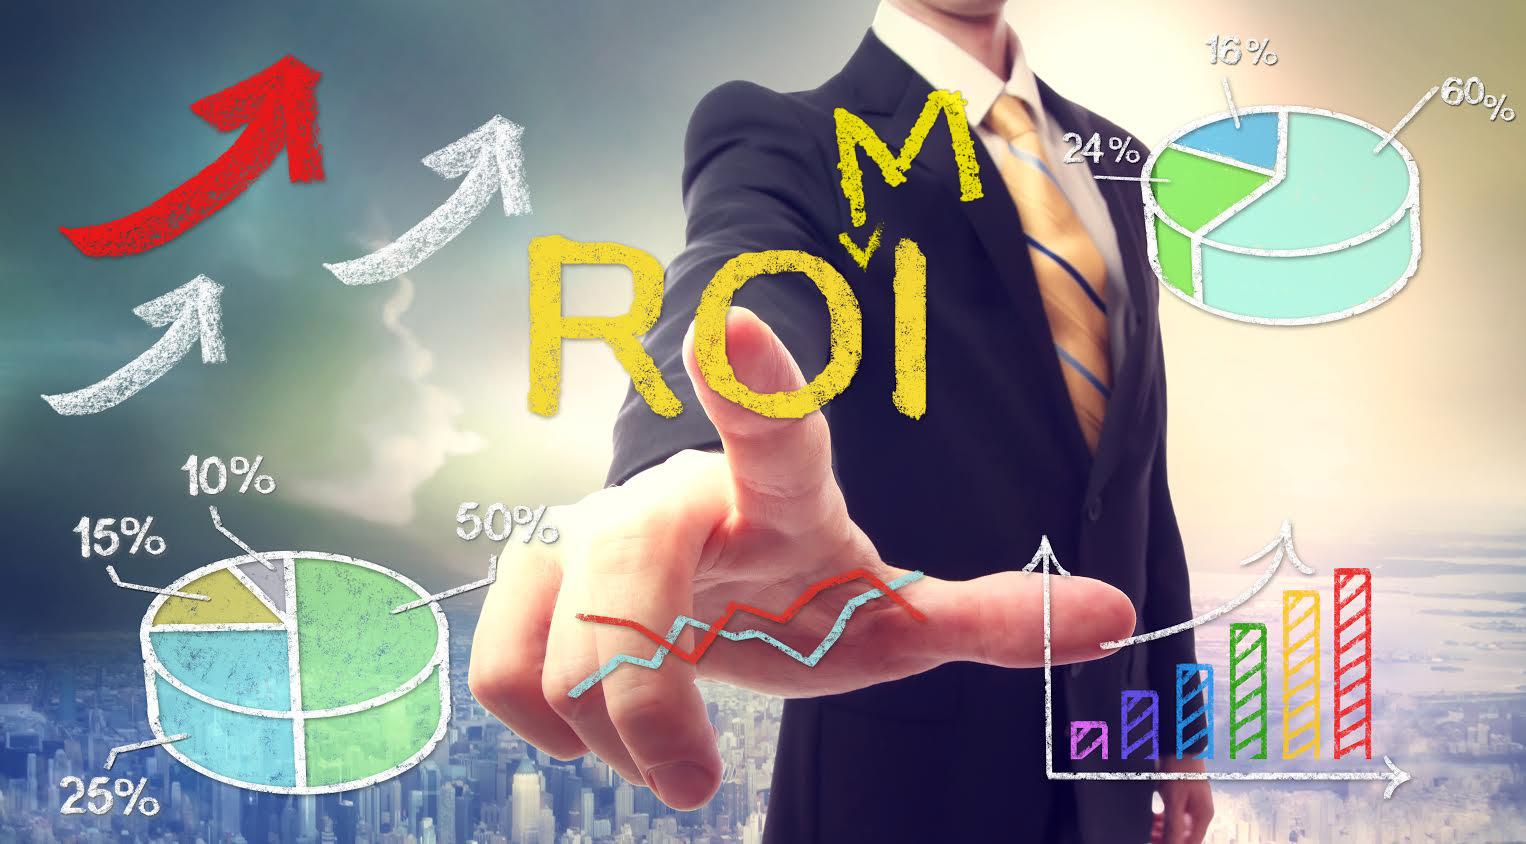 Your Company's ROMI